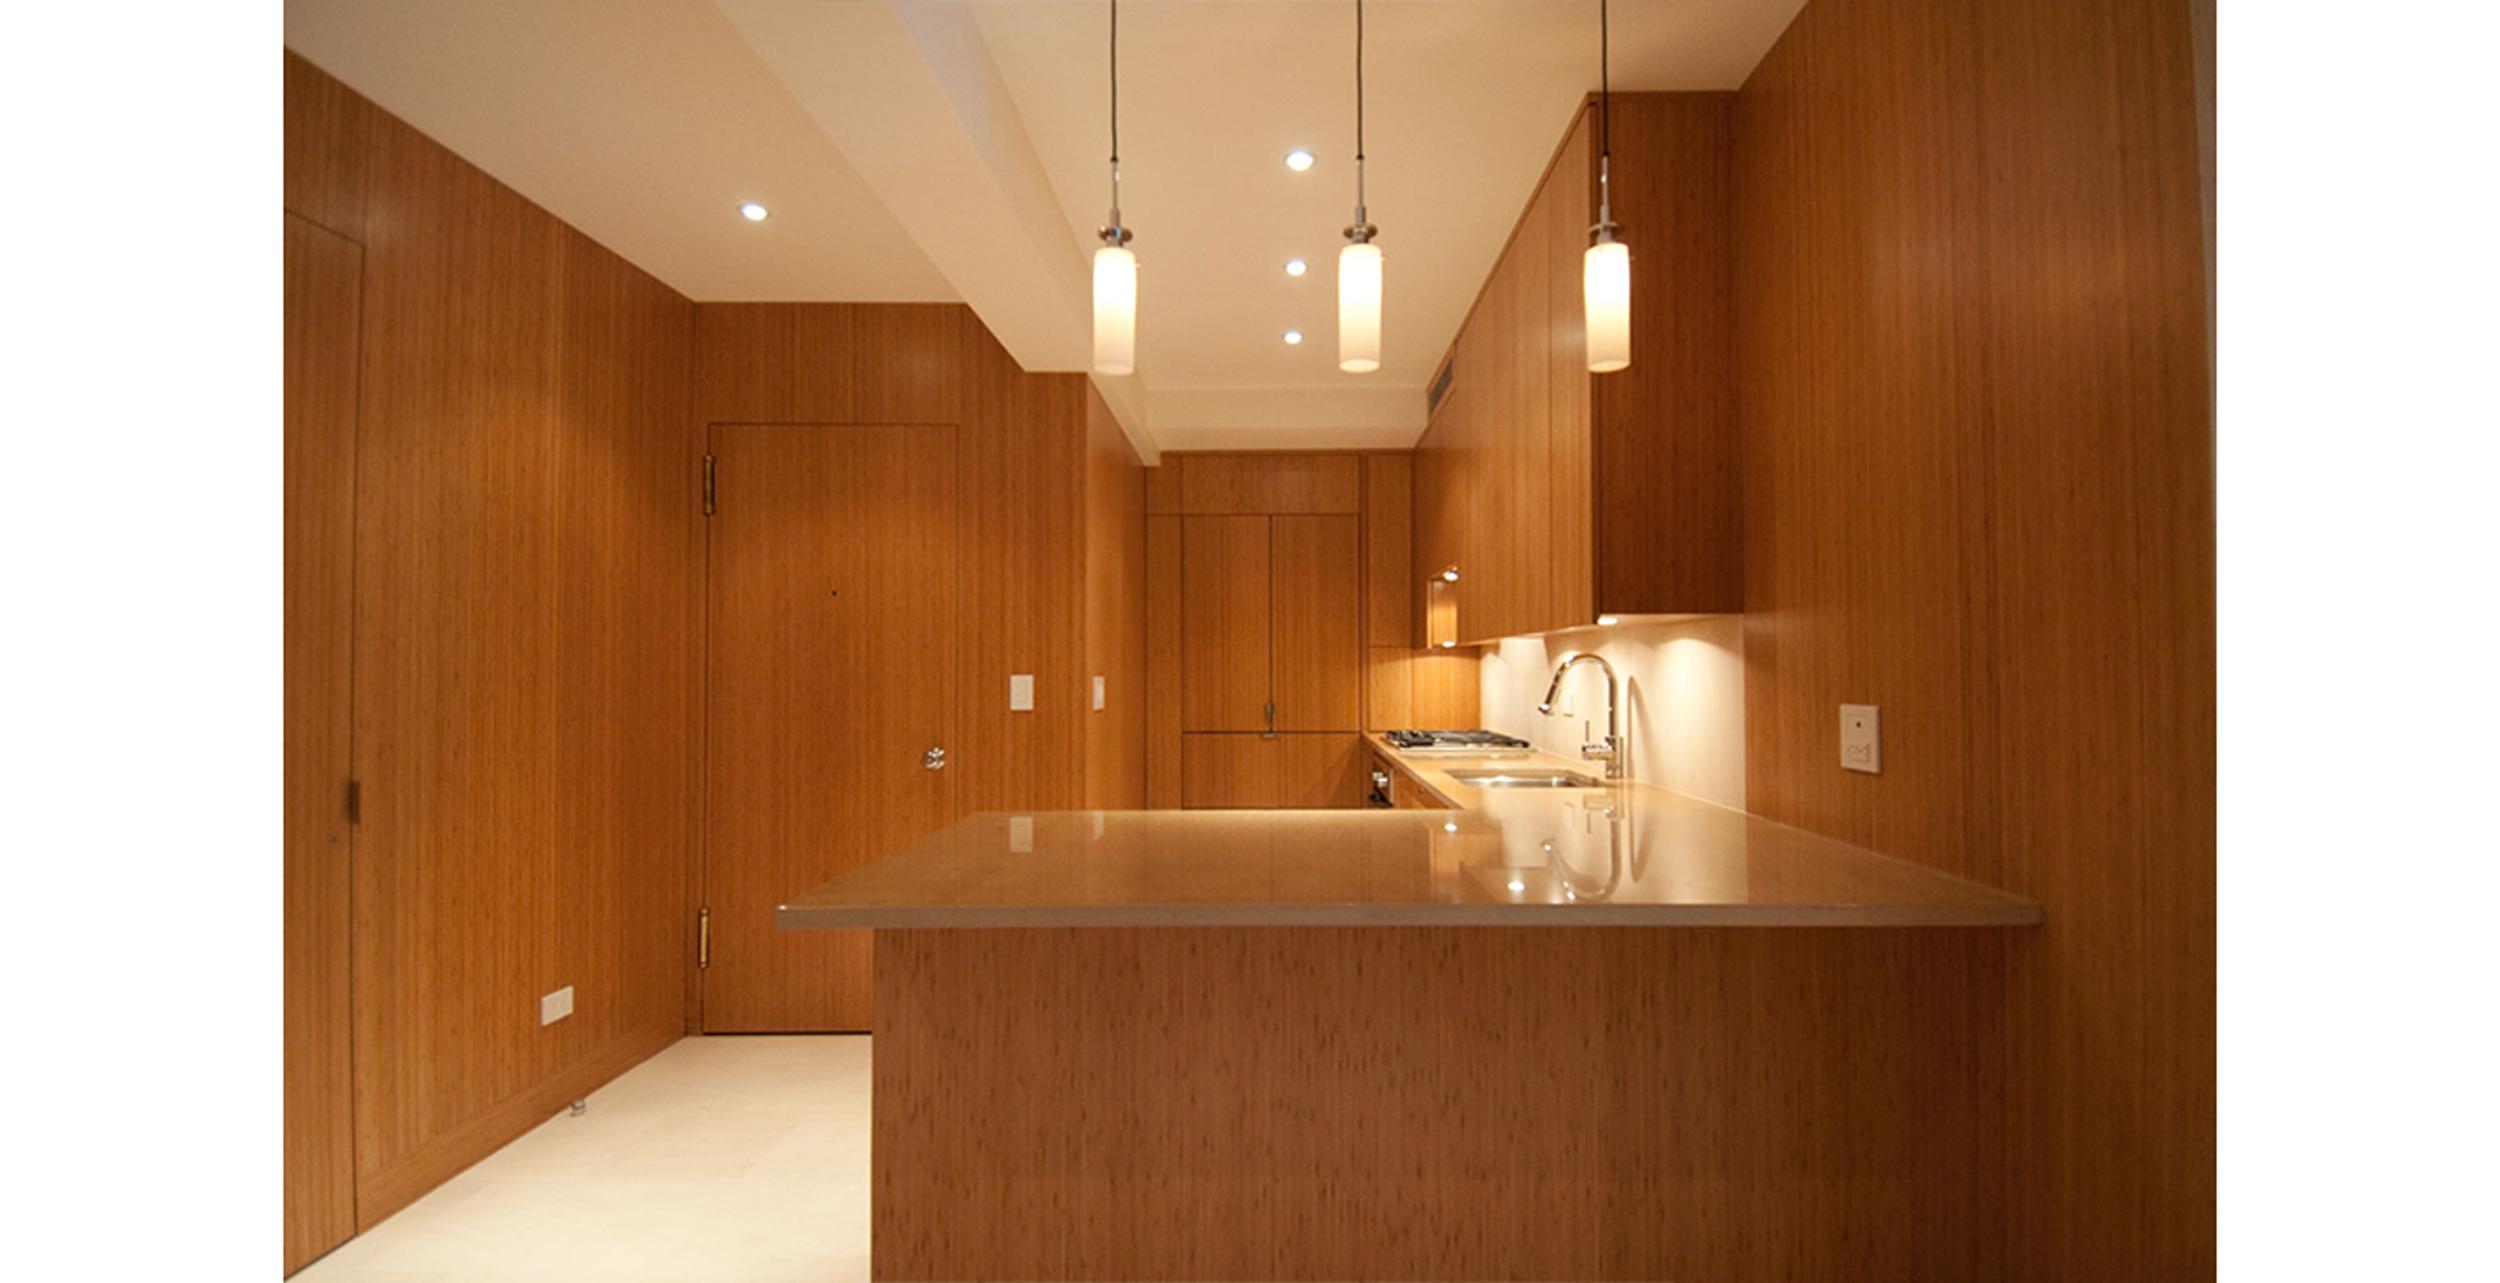 Central-Park-South-David-Bucovy-Architect.png